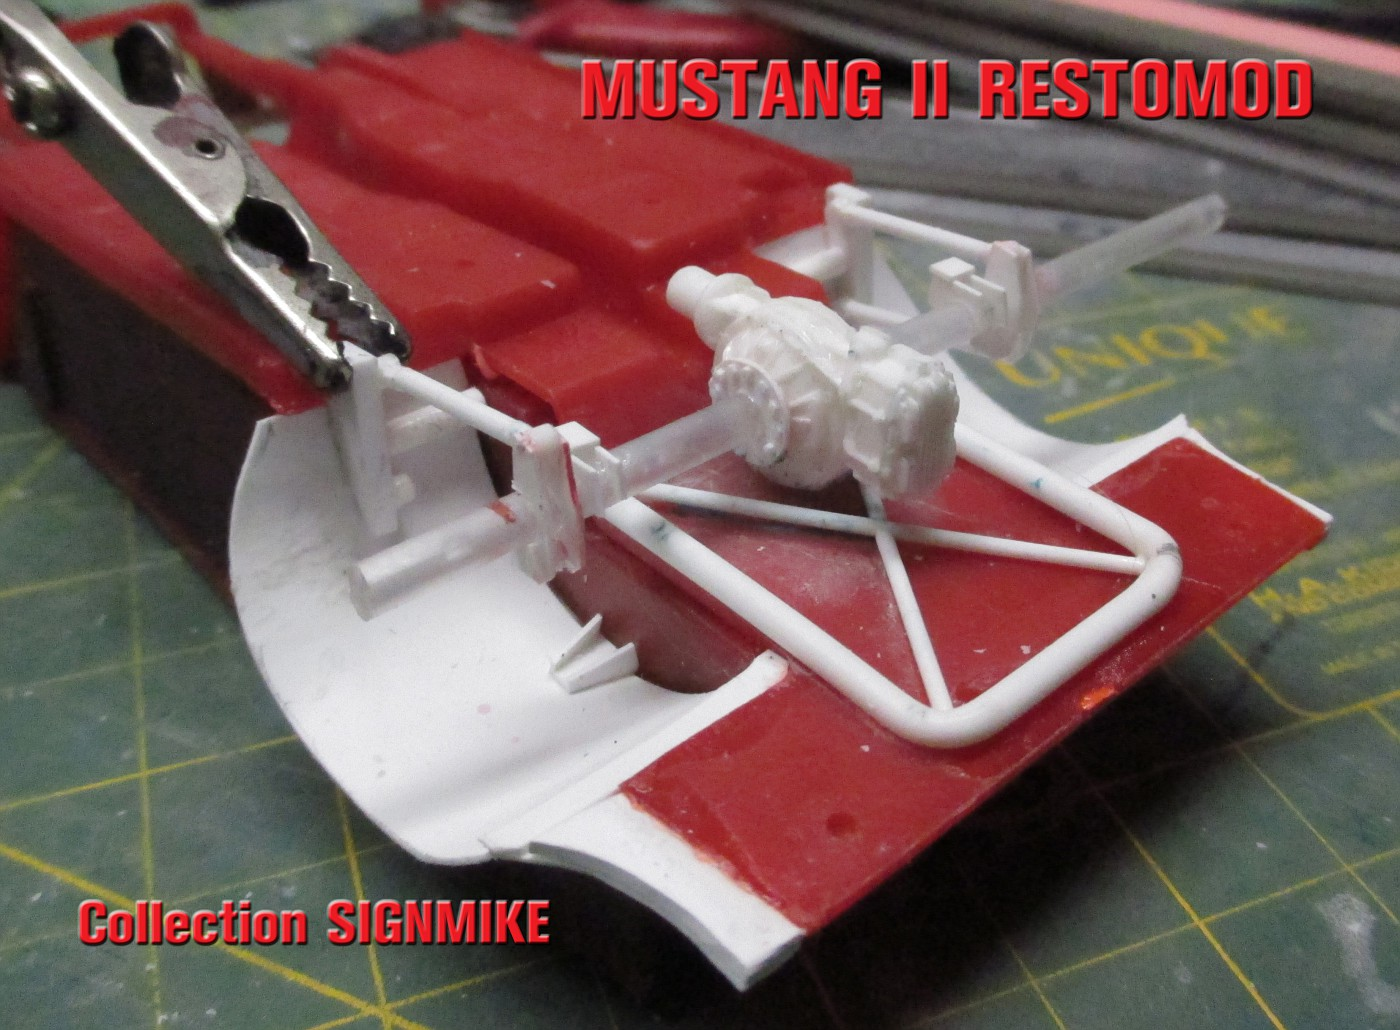 Mustang II RestoMod - Page 4 MustangIIRestomod35-vi